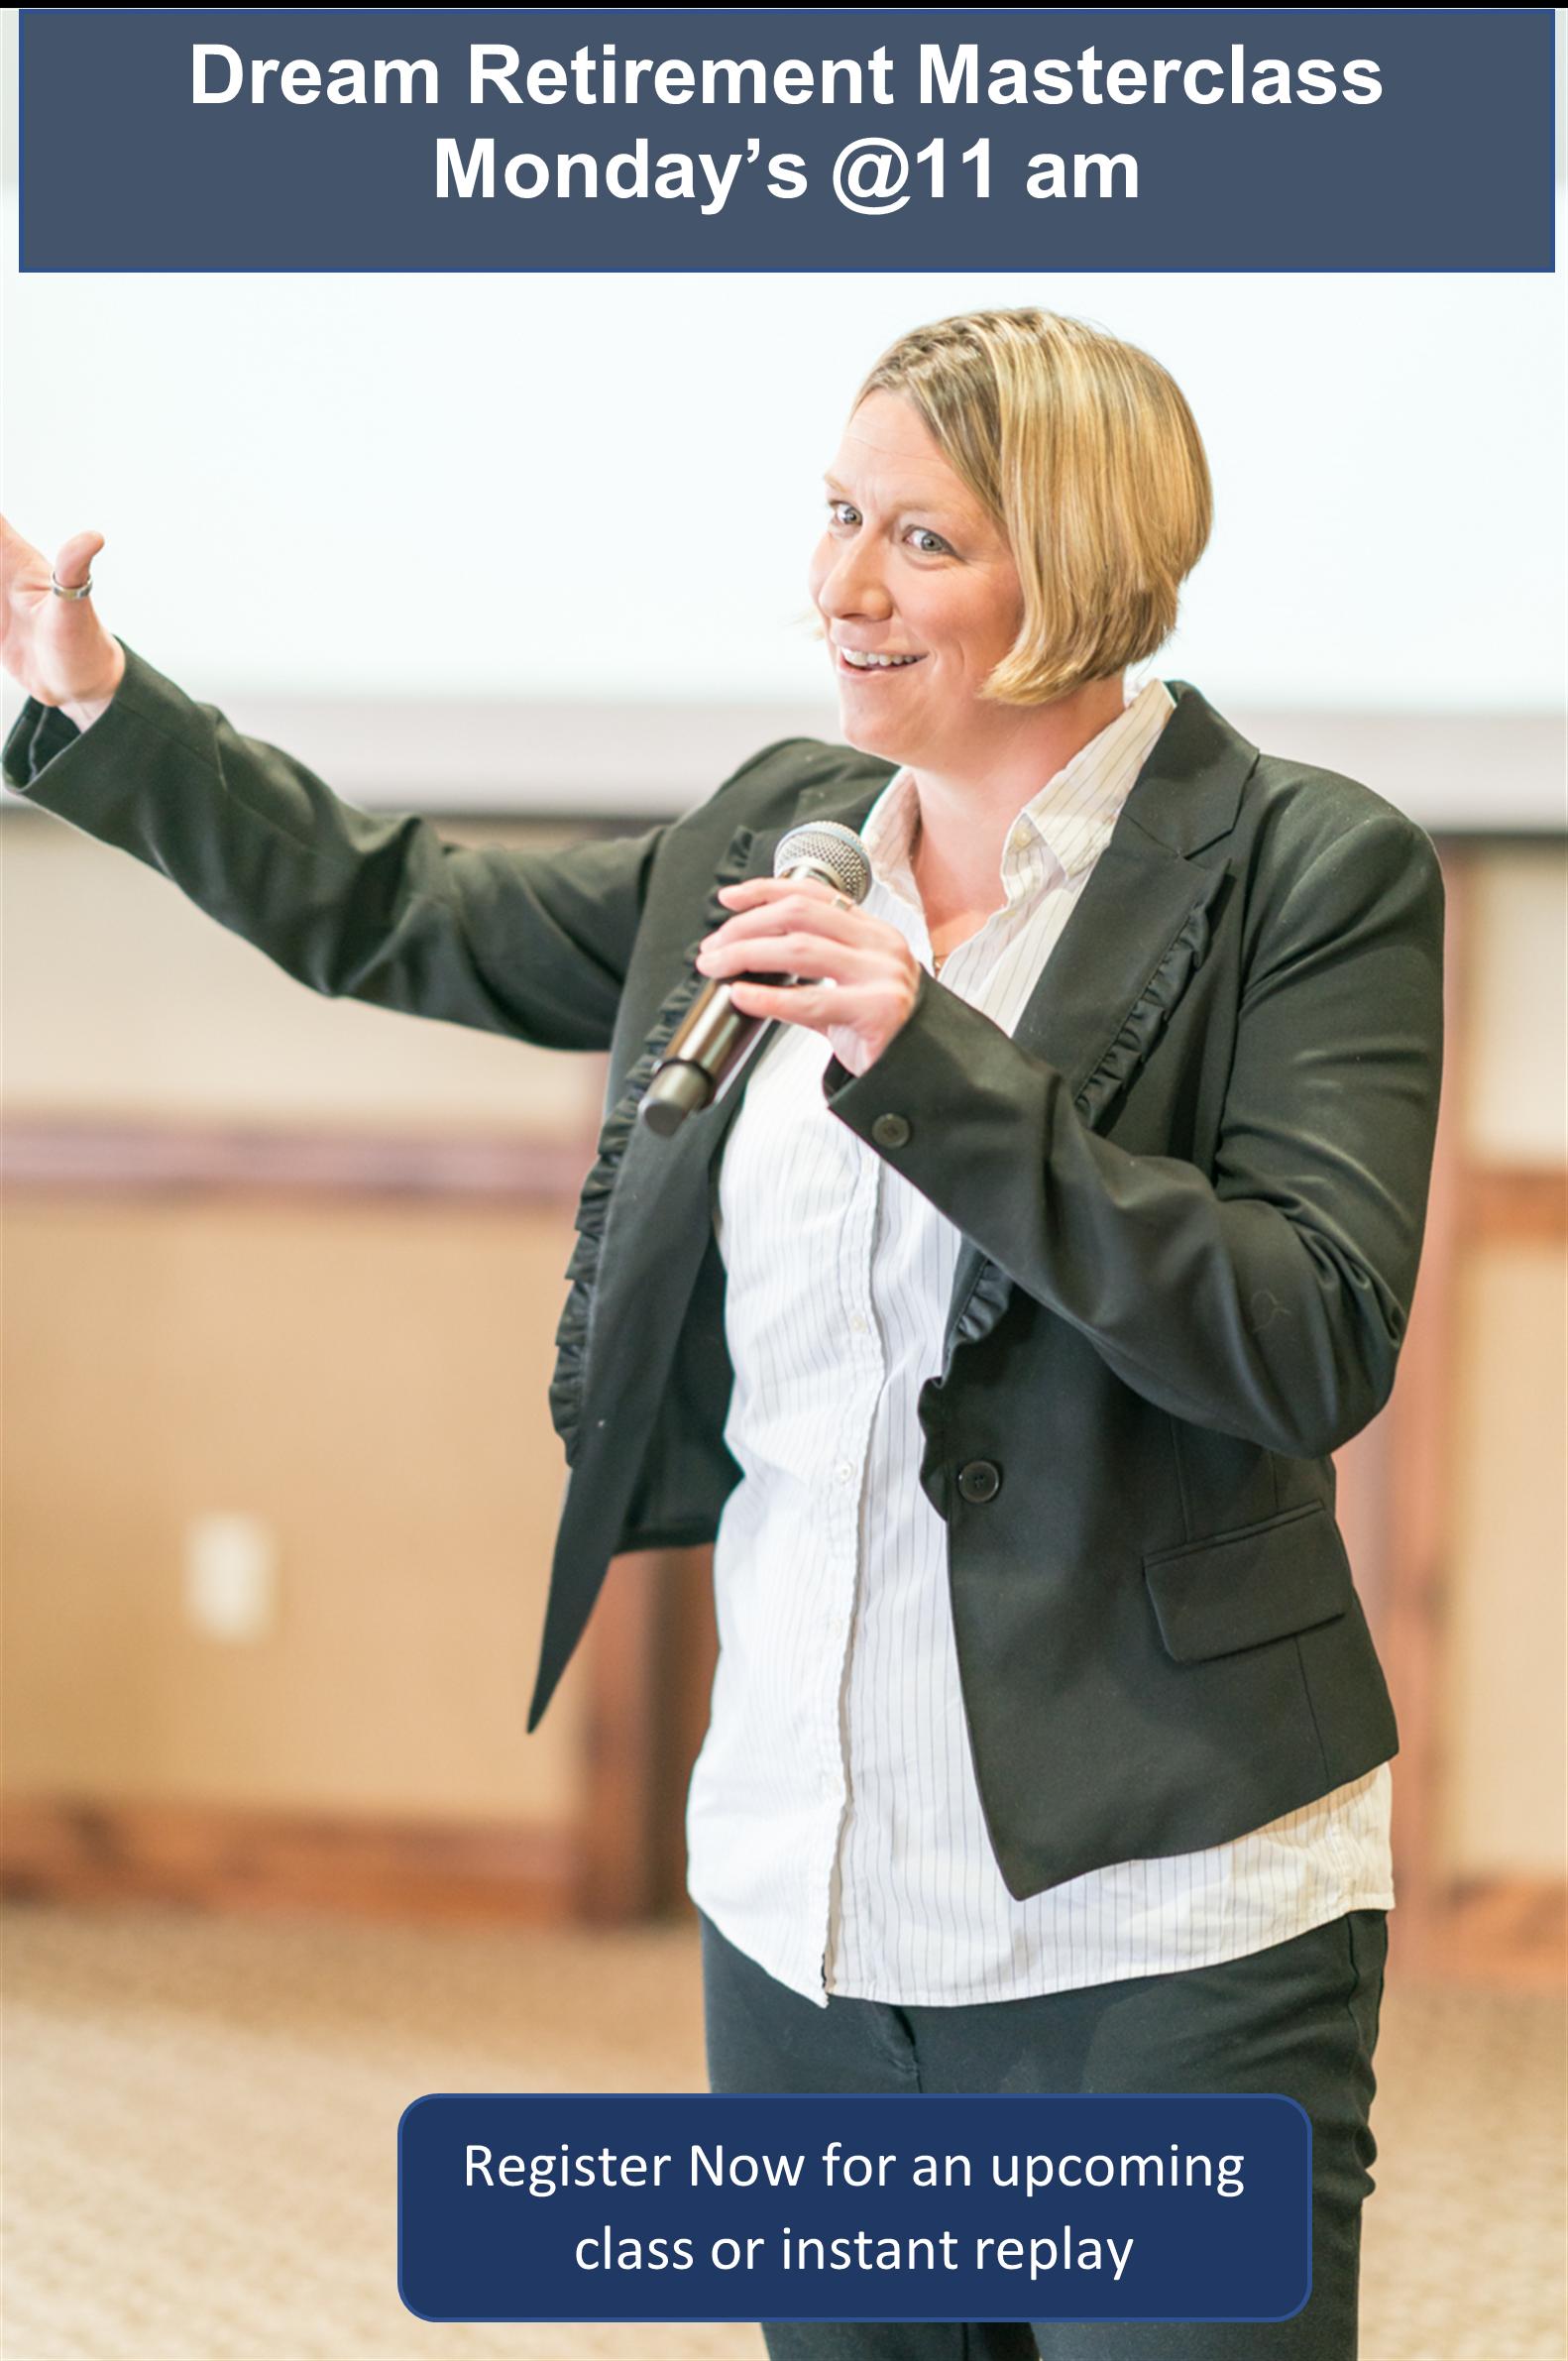 Michelle Bertram teaching the Retirement Masterclass